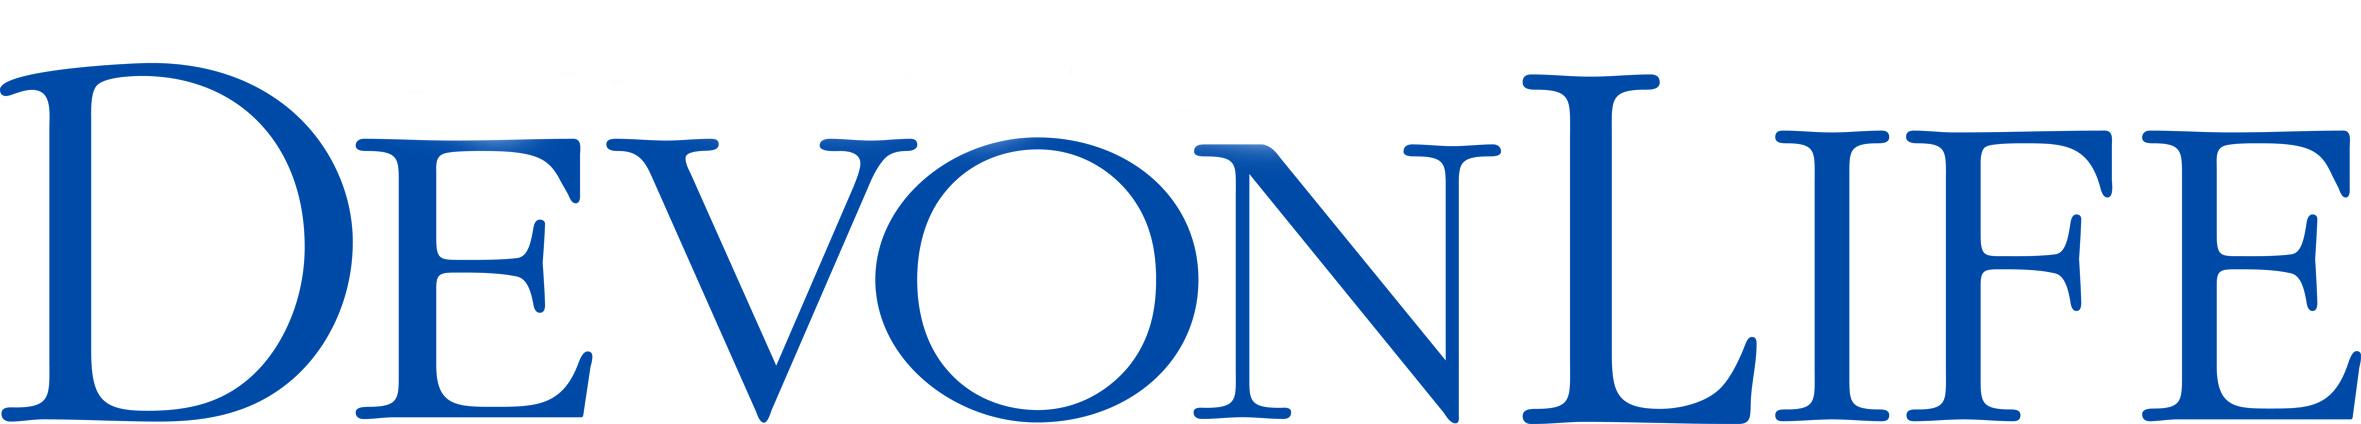 devon-life-logo.jpg